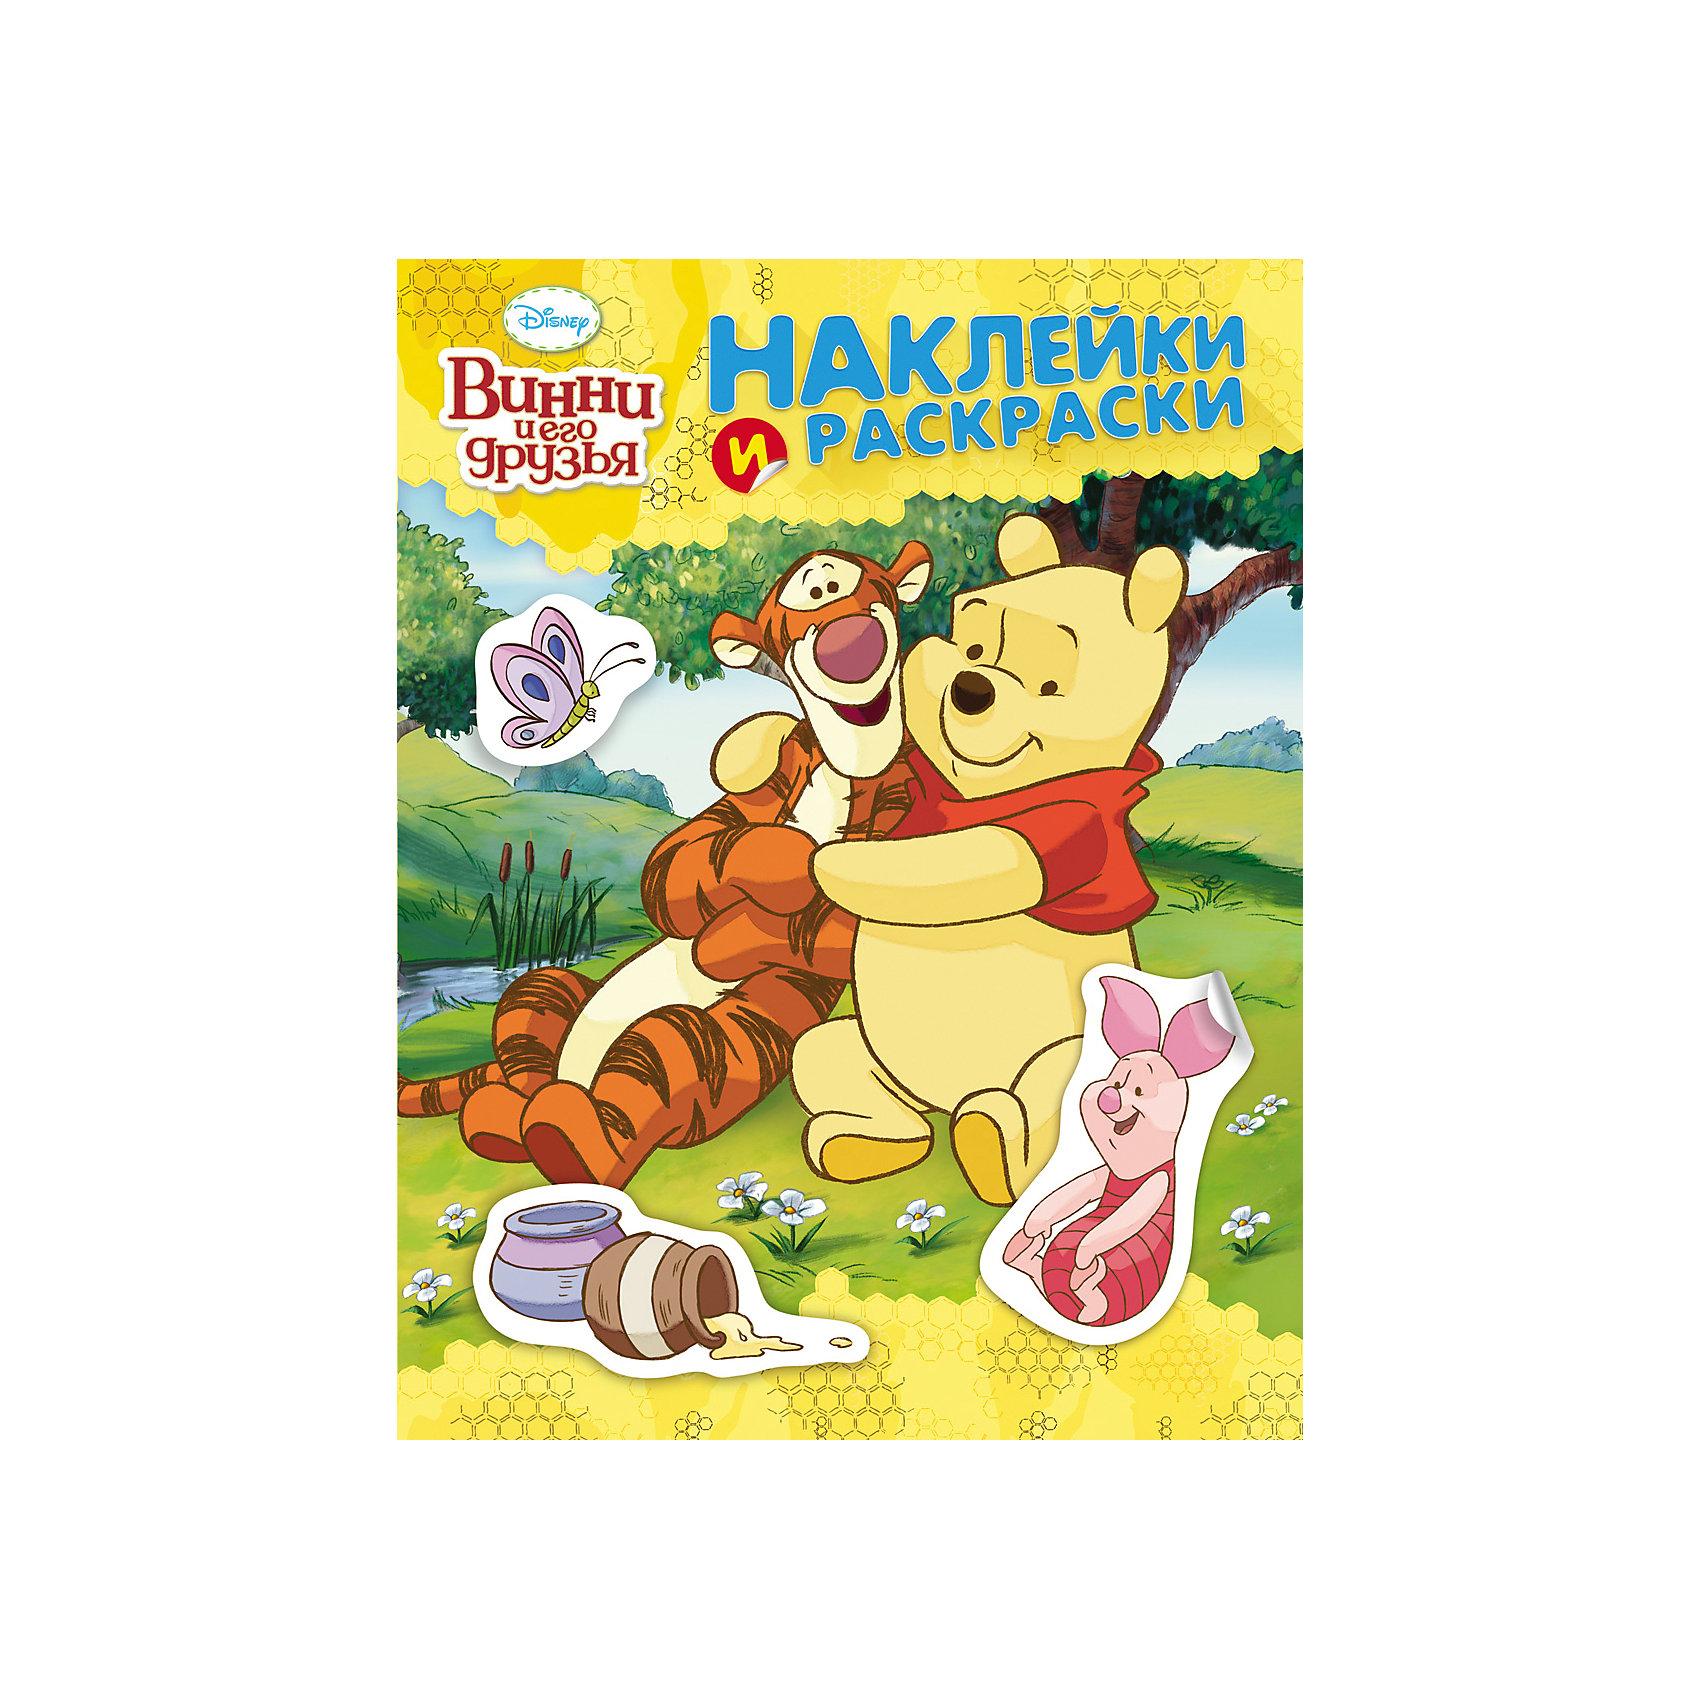 Росмэн Наклейки и раскраски, Винни и его друзья раскраски умка мозаика и наклейки винни пух